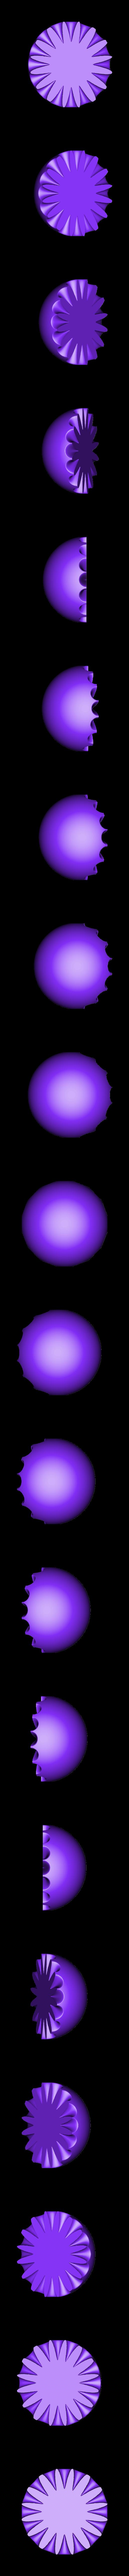 Hemisphere_Bowl_7.STL Download free STL file Hemisphere Bowl 7 • 3D printing object, David_Mussaffi